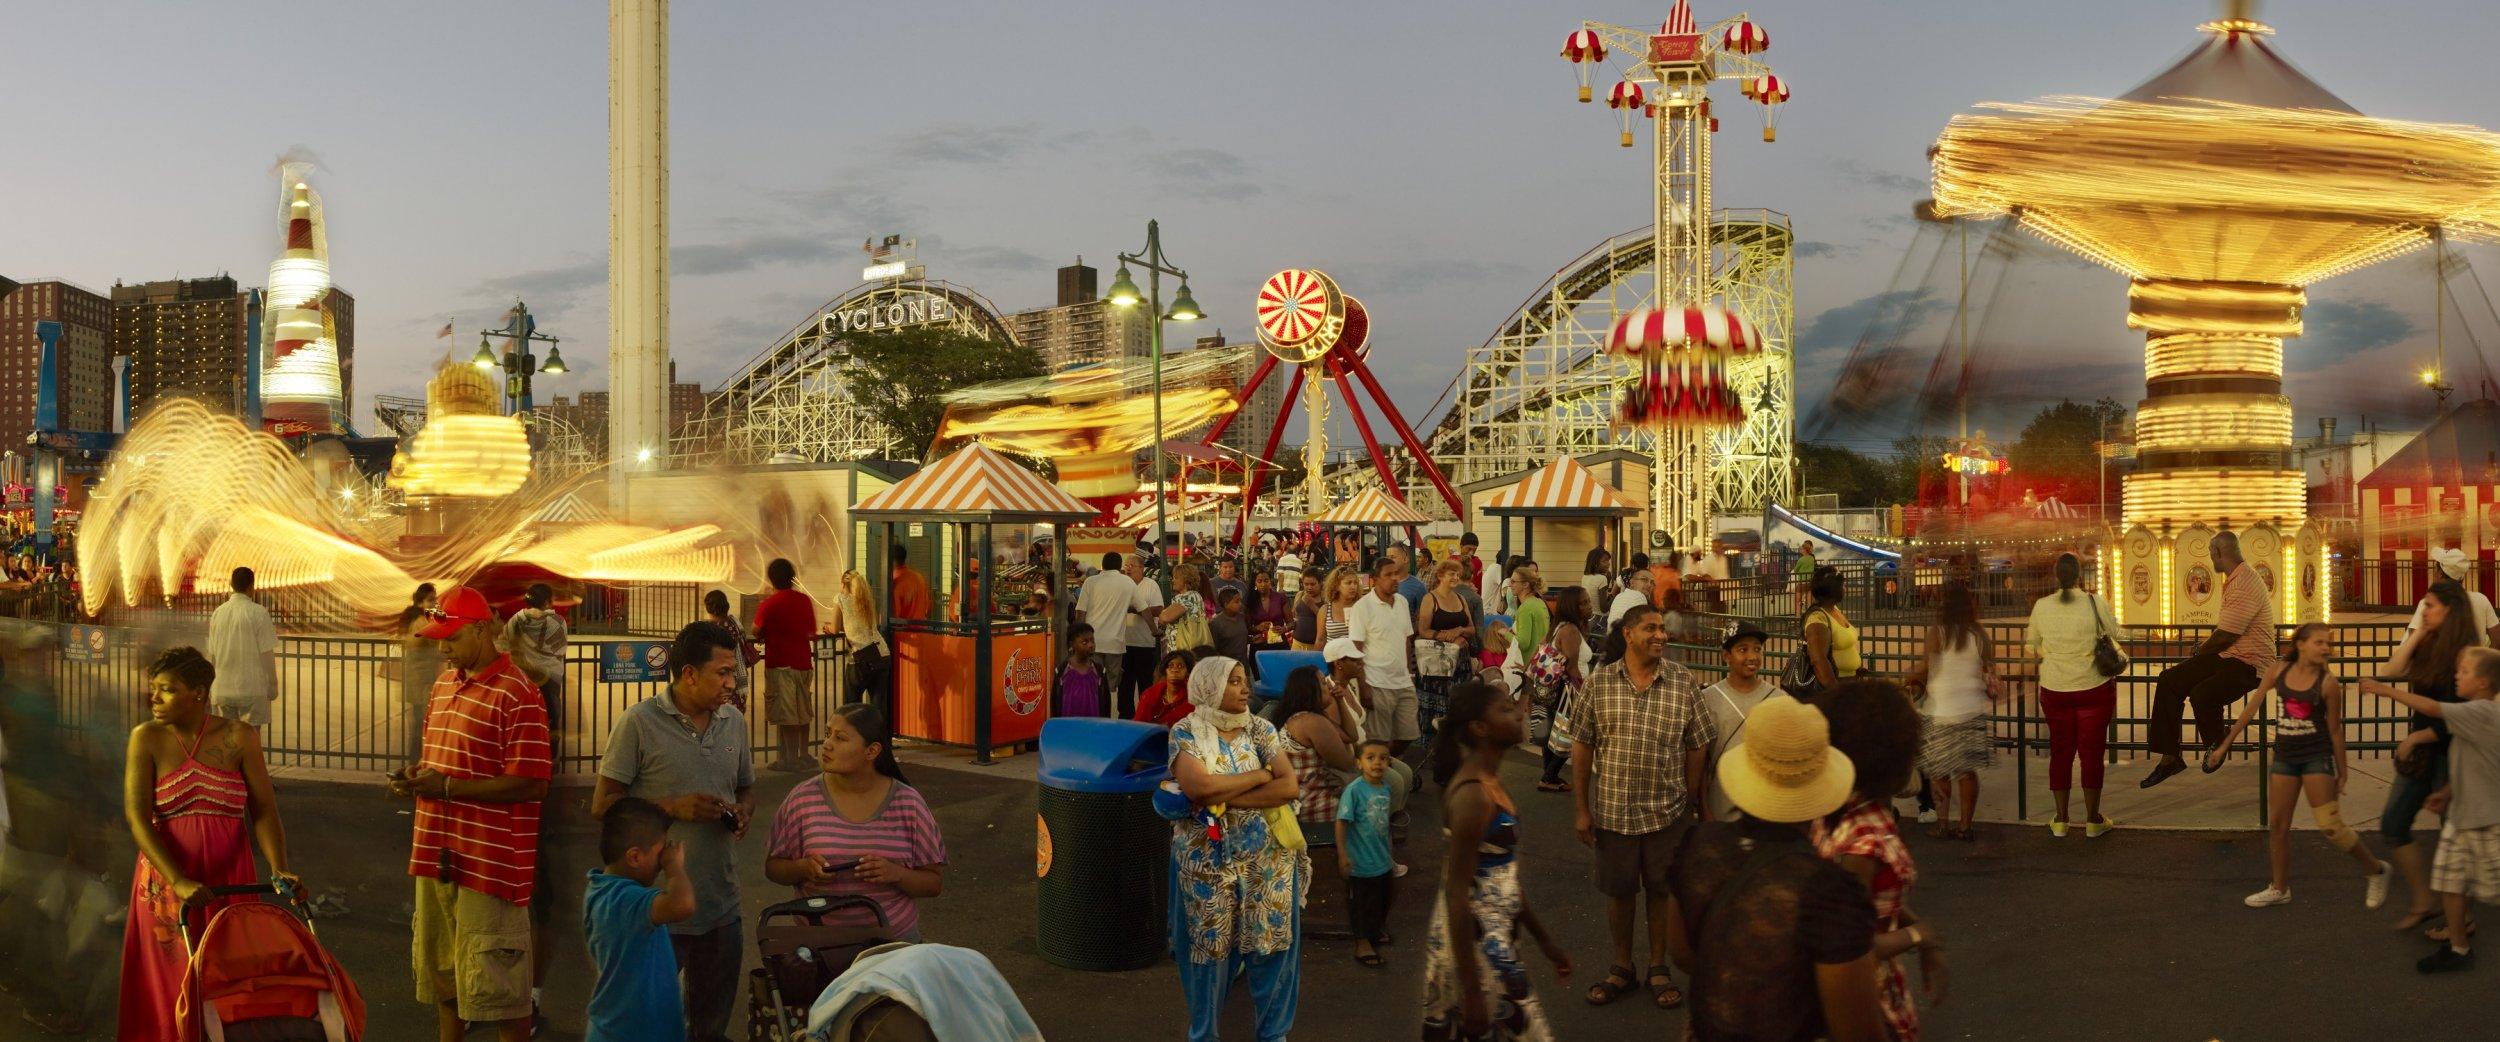 10-16-14 Jeff Liao Coney Island